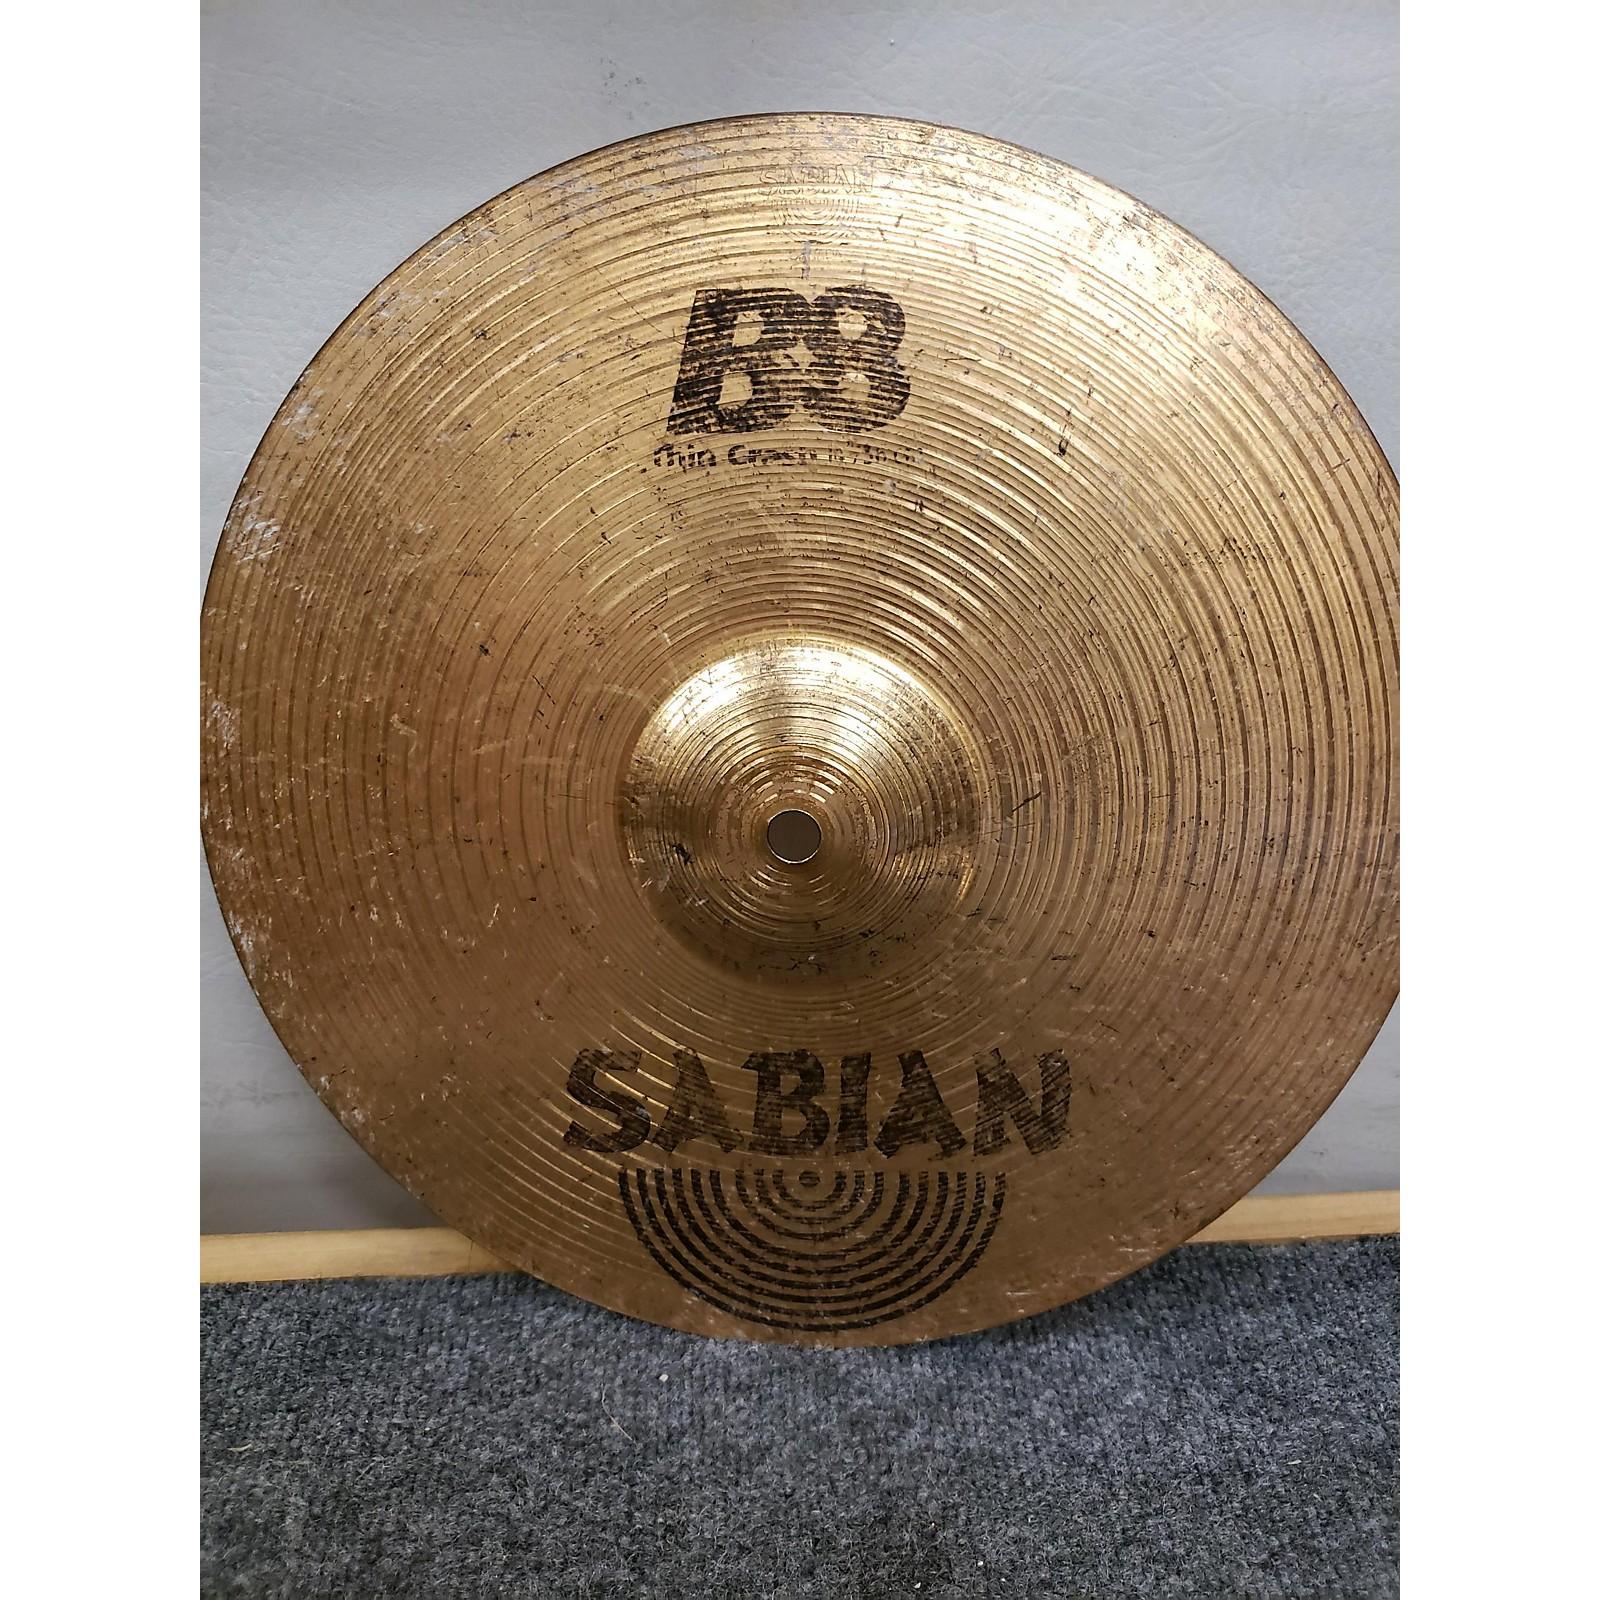 Sabian 12in B8 Thin Crash Cymbal